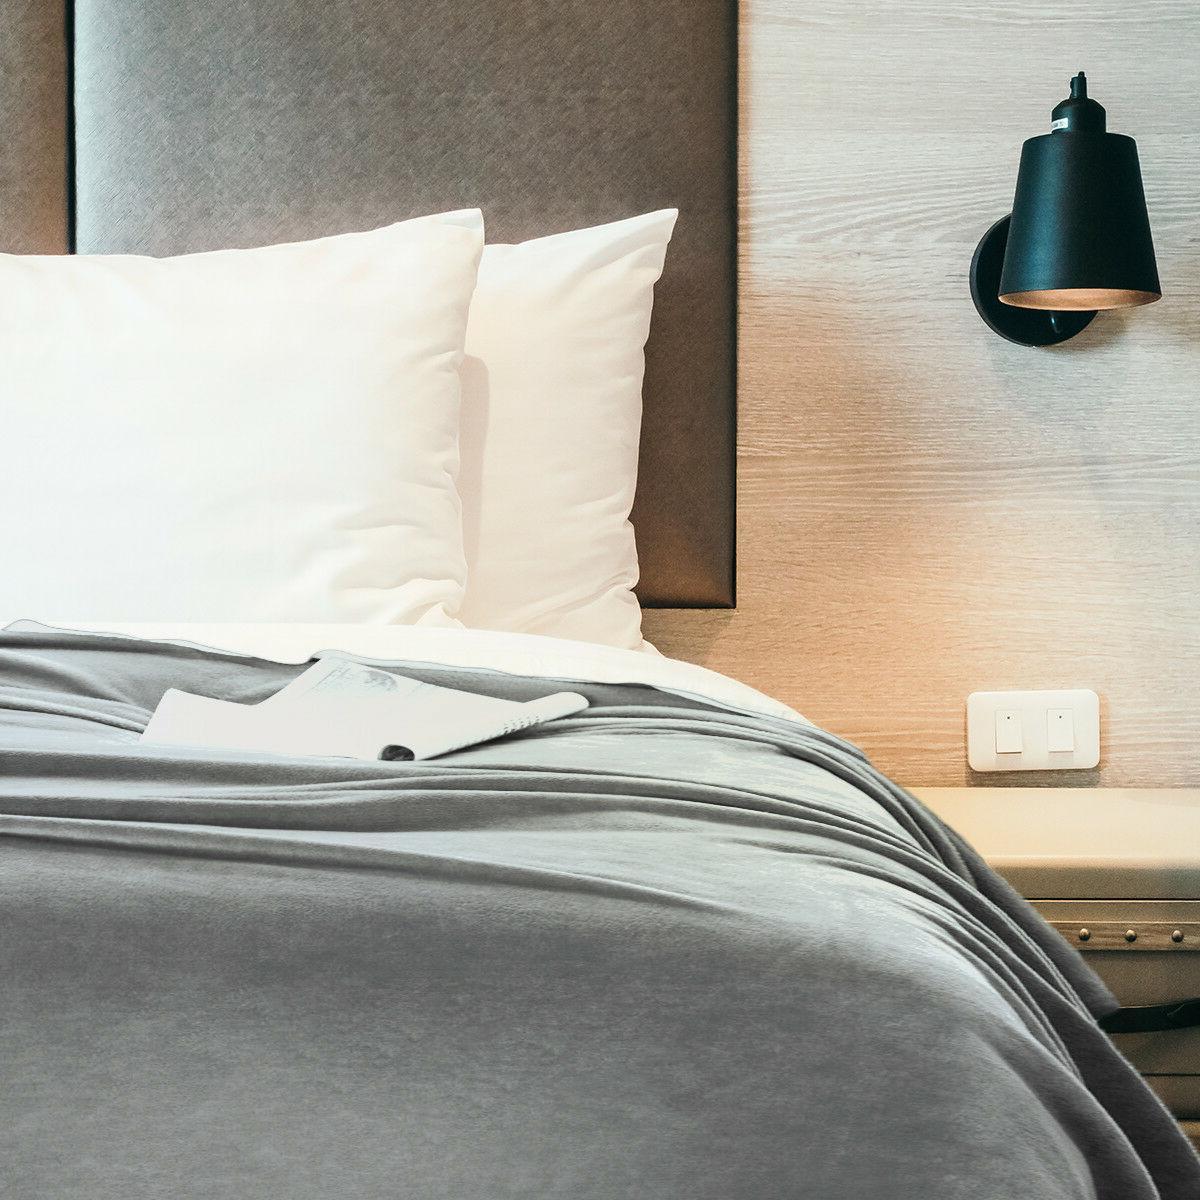 Bedsure Blanket Blanket Bed